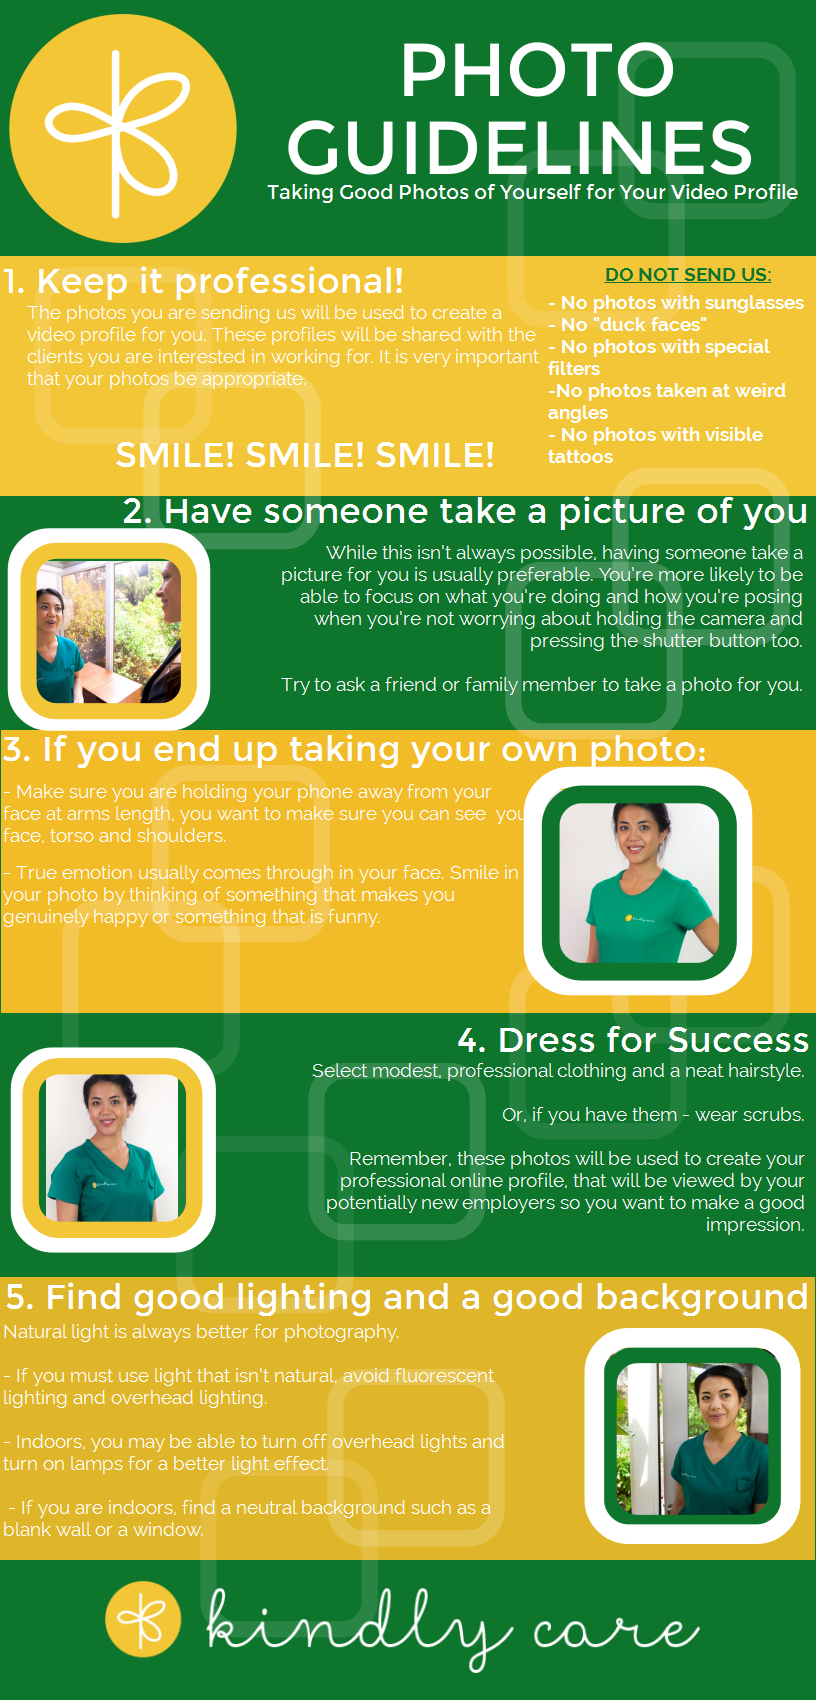 CG Photo Guidelines